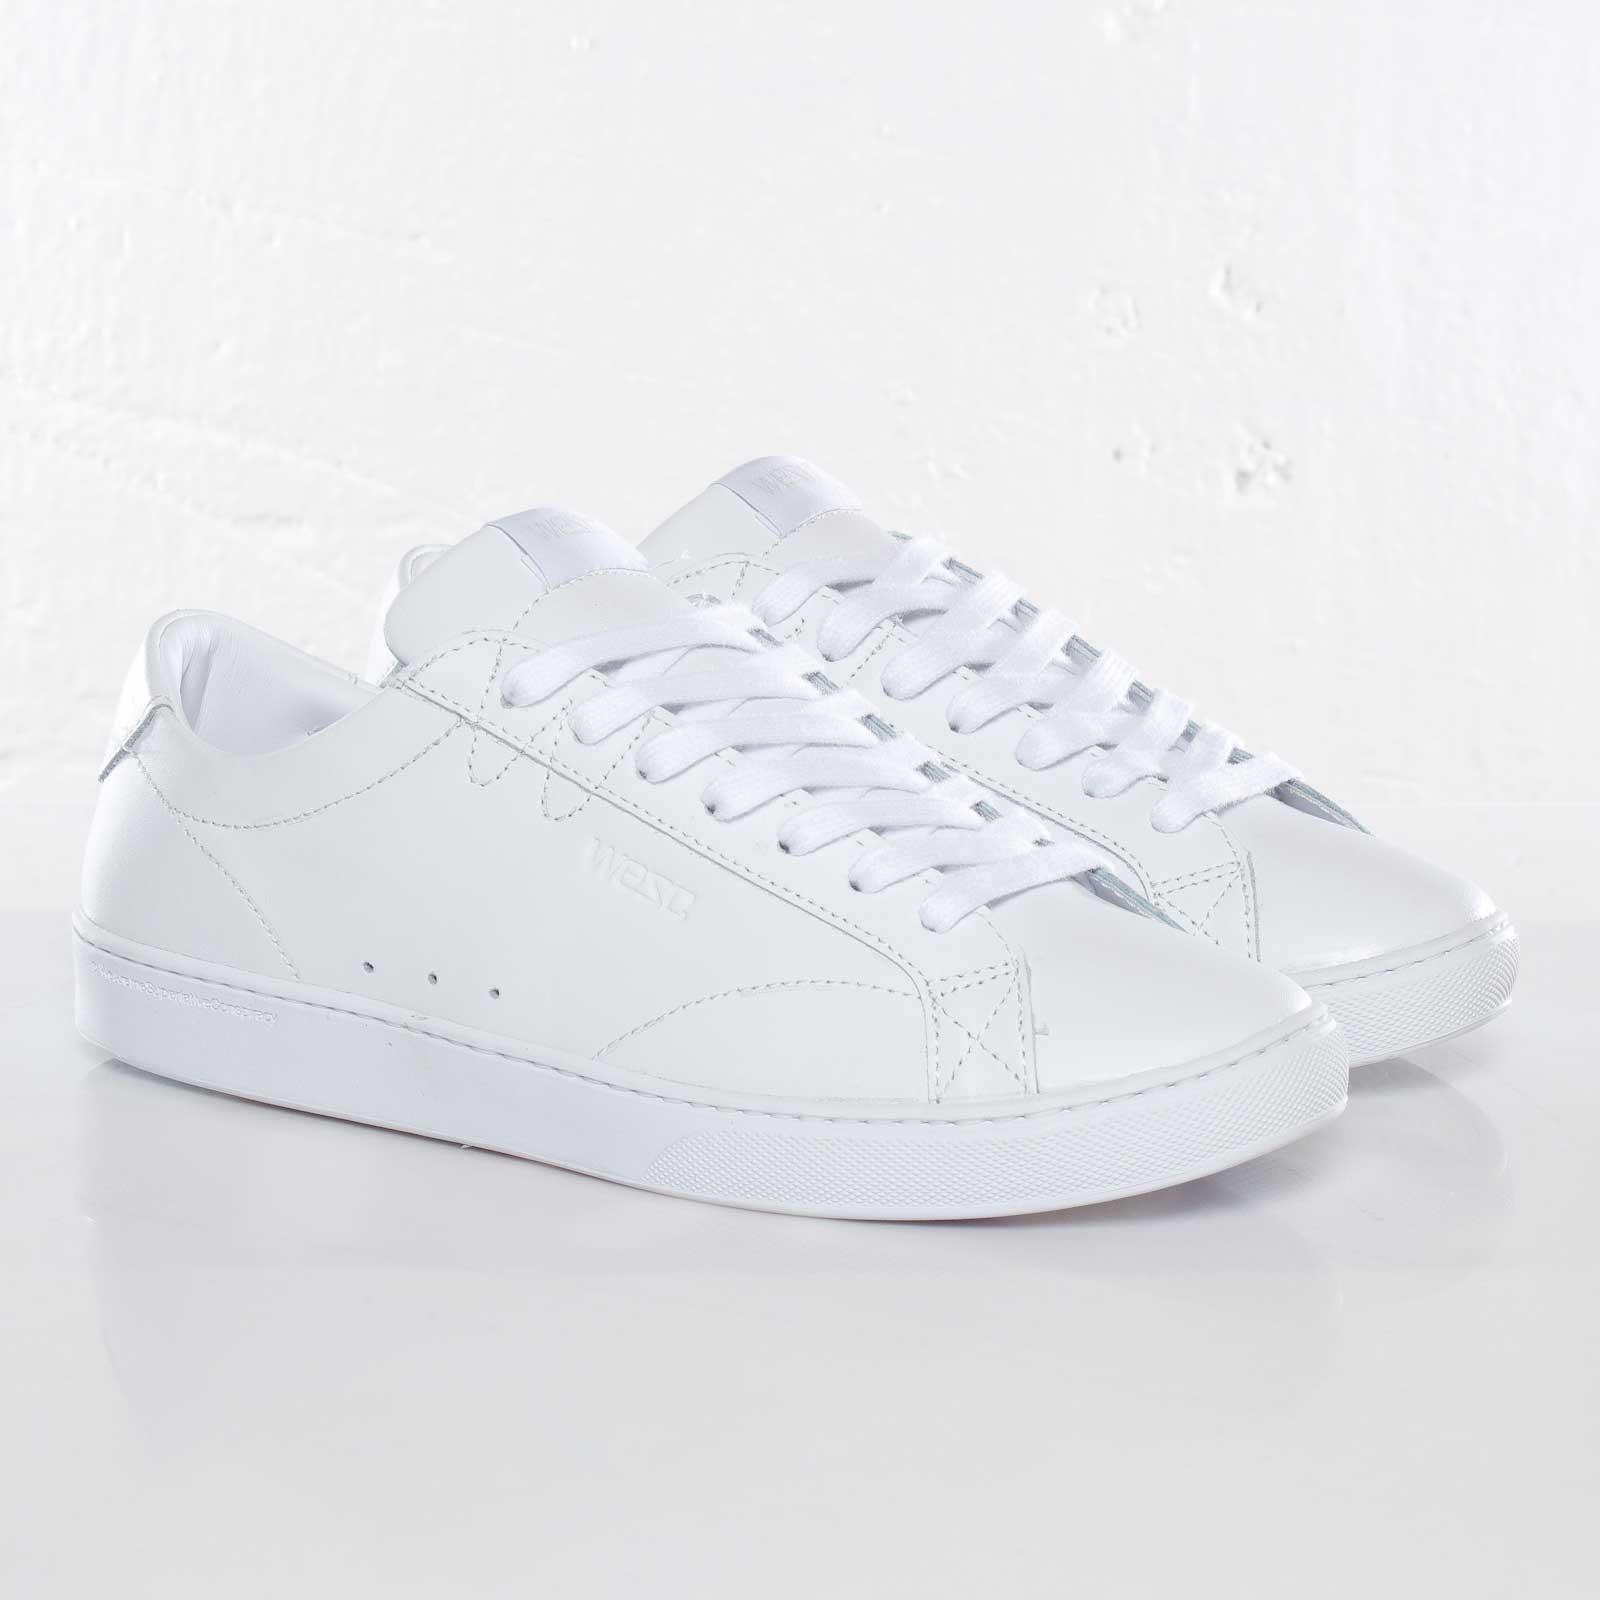 amp; amp; amp; WESC Sneakersnstuff streetwear streetwear streetwear streetwear Clopton sneakers D105494001 ApF0x8pq